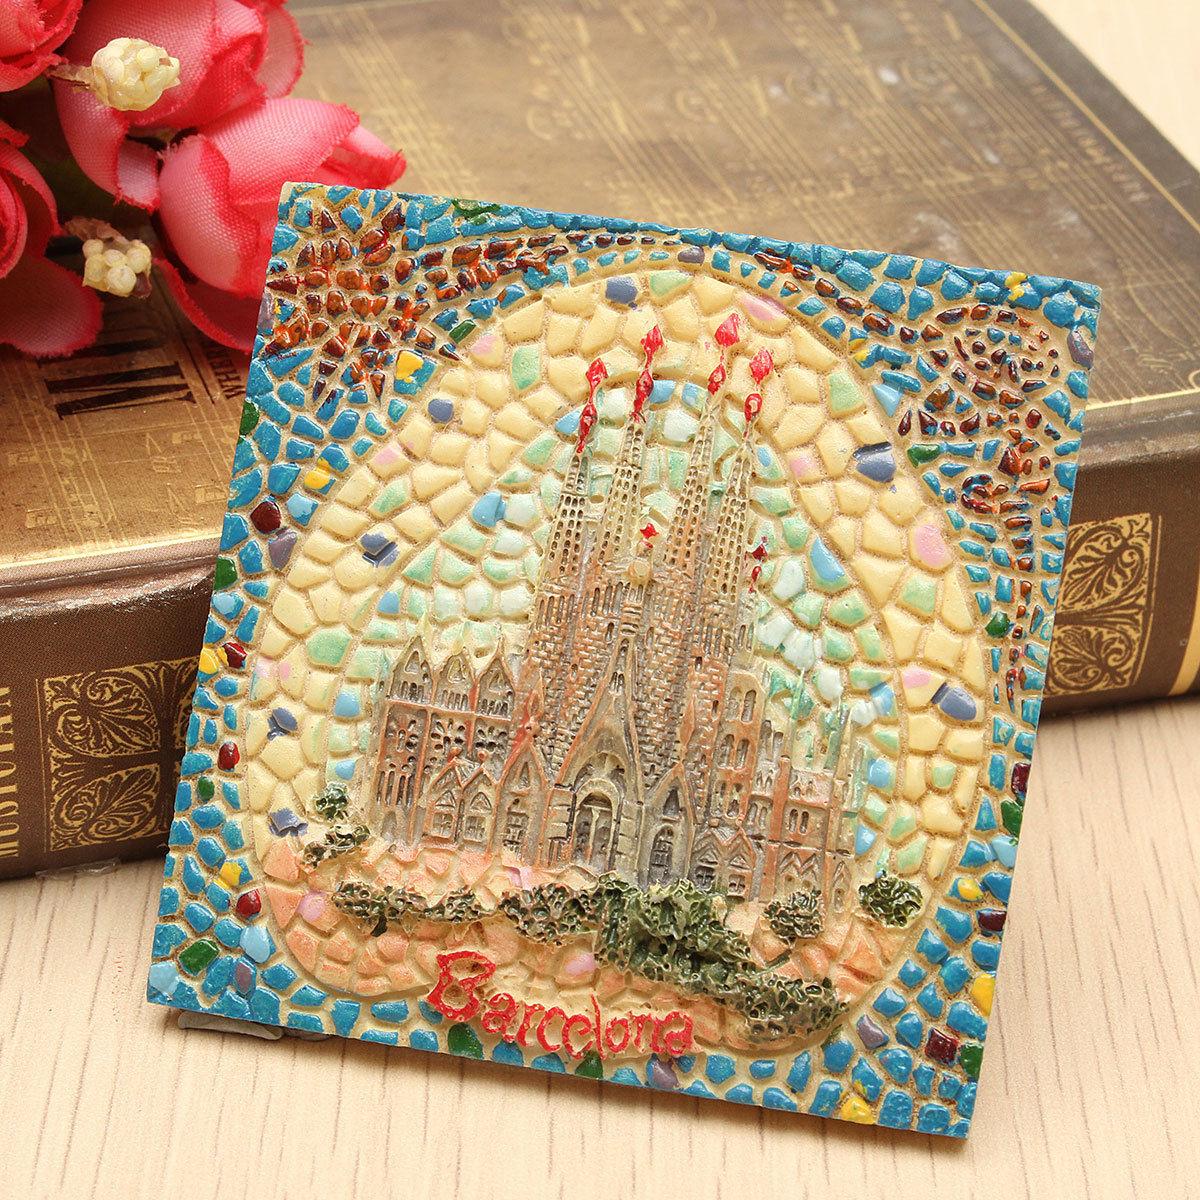 61mm Spain Tourist Souvenirs Gaudi Sagrada Familia Barcelona Fridge Magnets Hand-painted 3D Resin refrigerator stickers